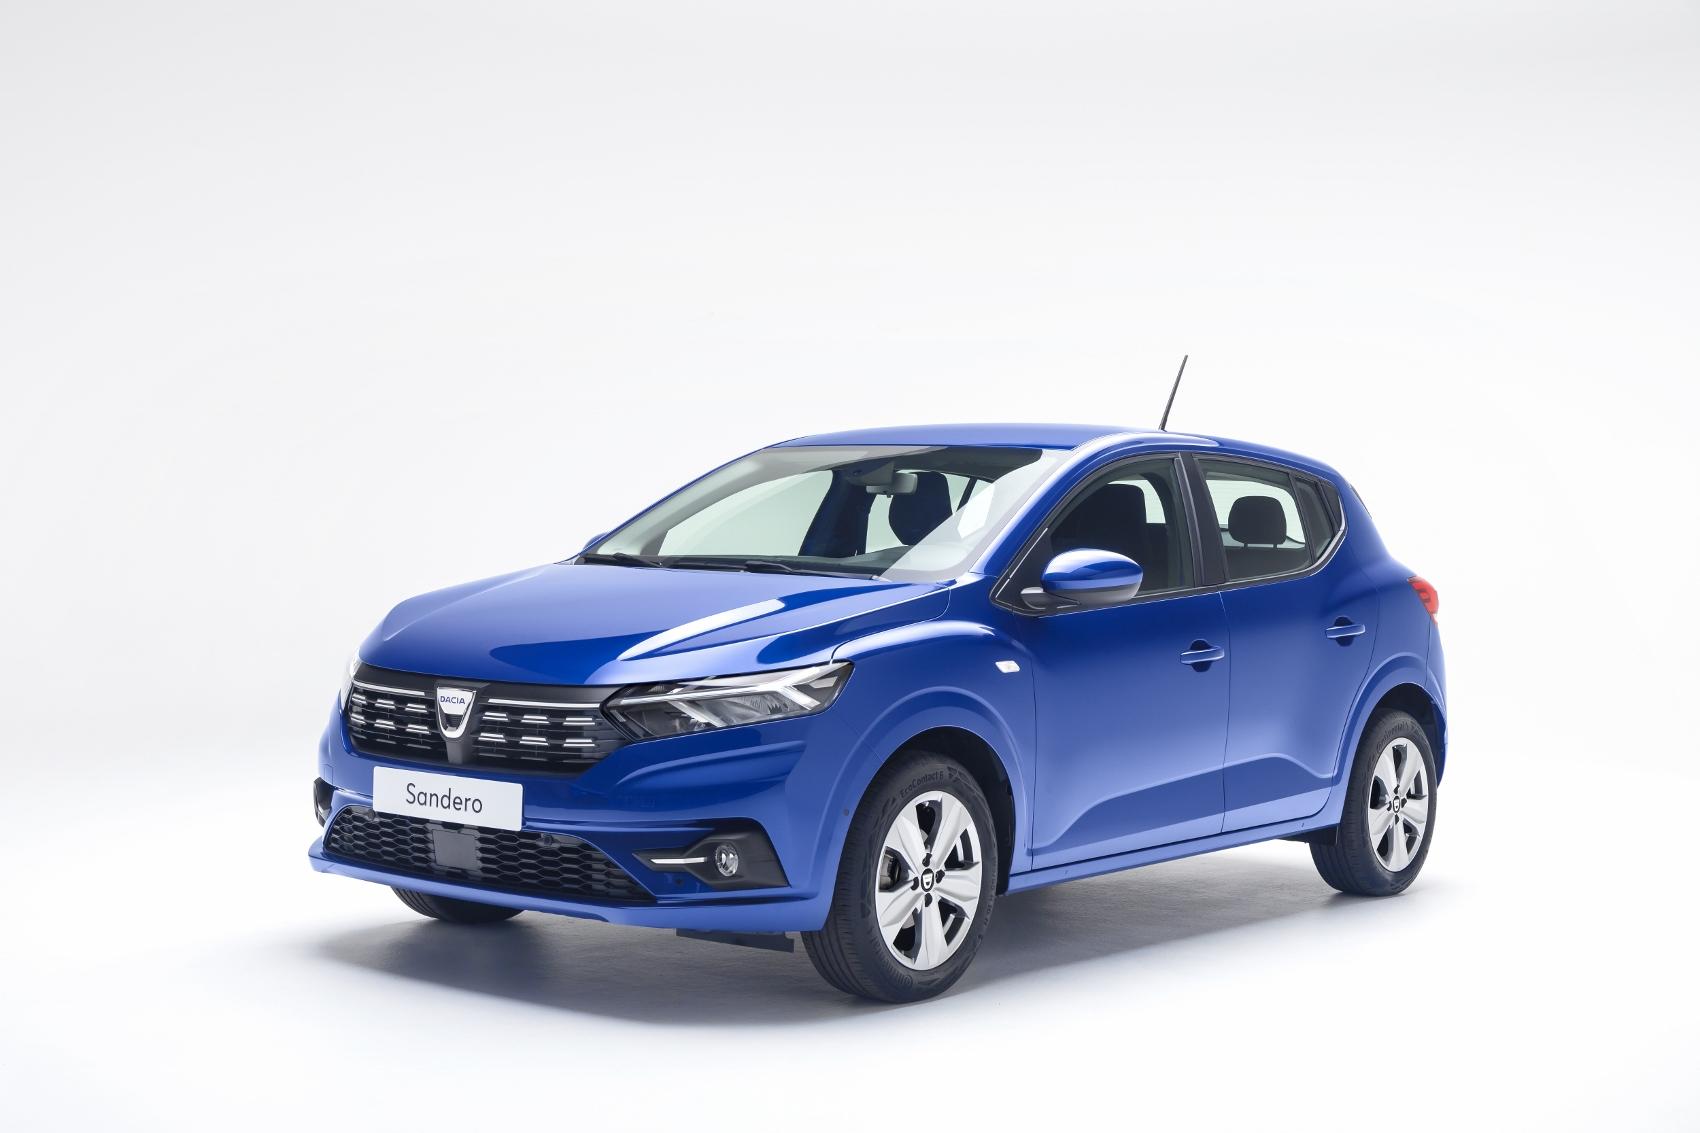 2020 - New Dacia SANDERO (1) (1700x1133)